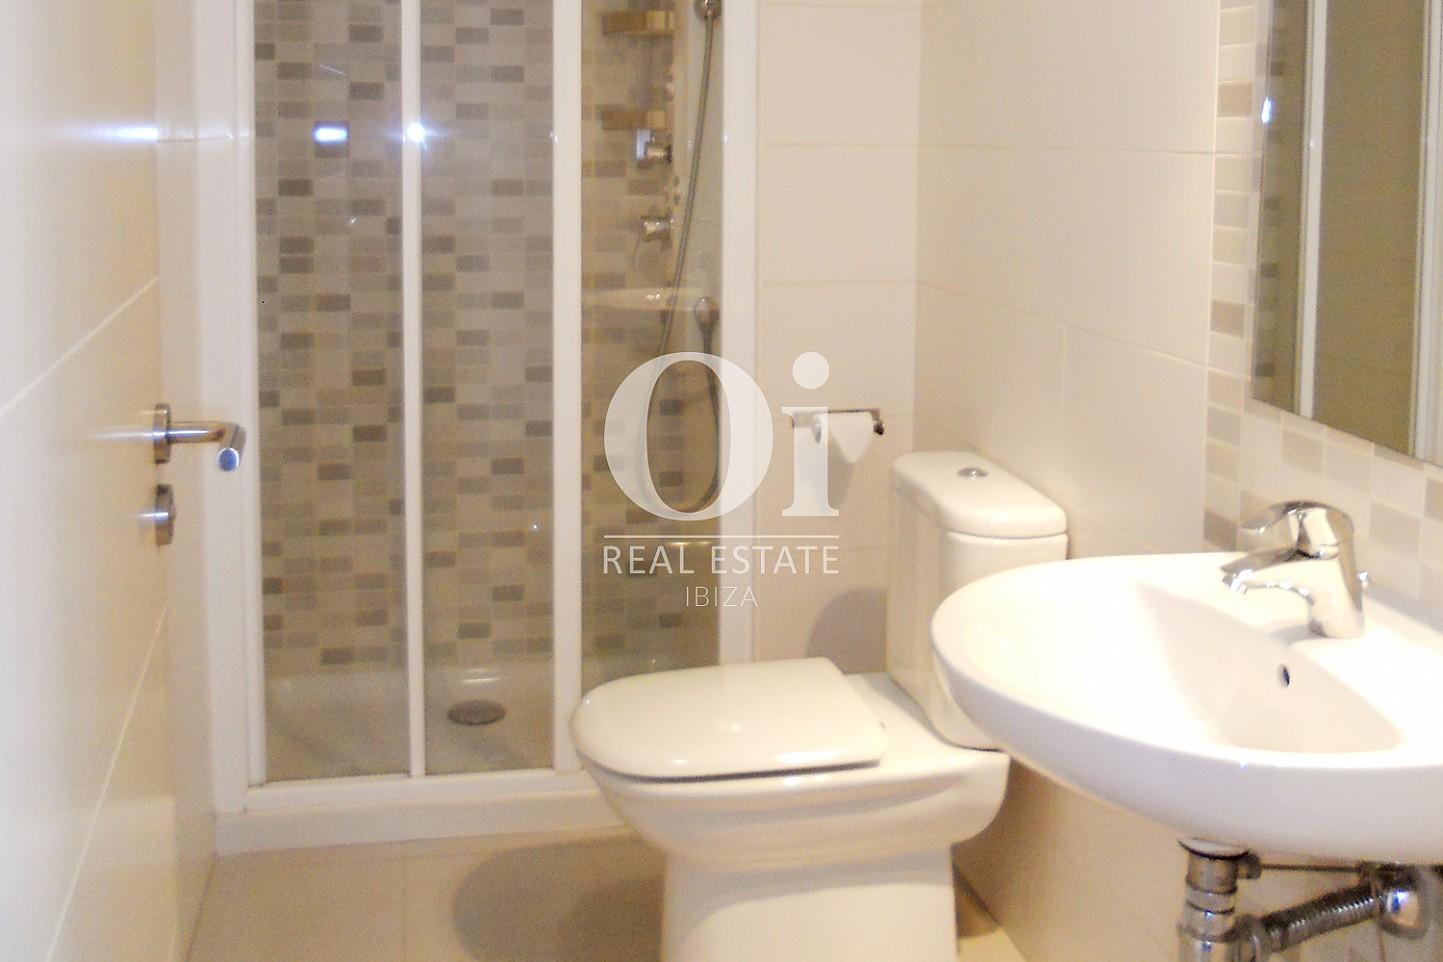 Salle de bain d'appartement à vendre à Cala Gracio, Ibiza